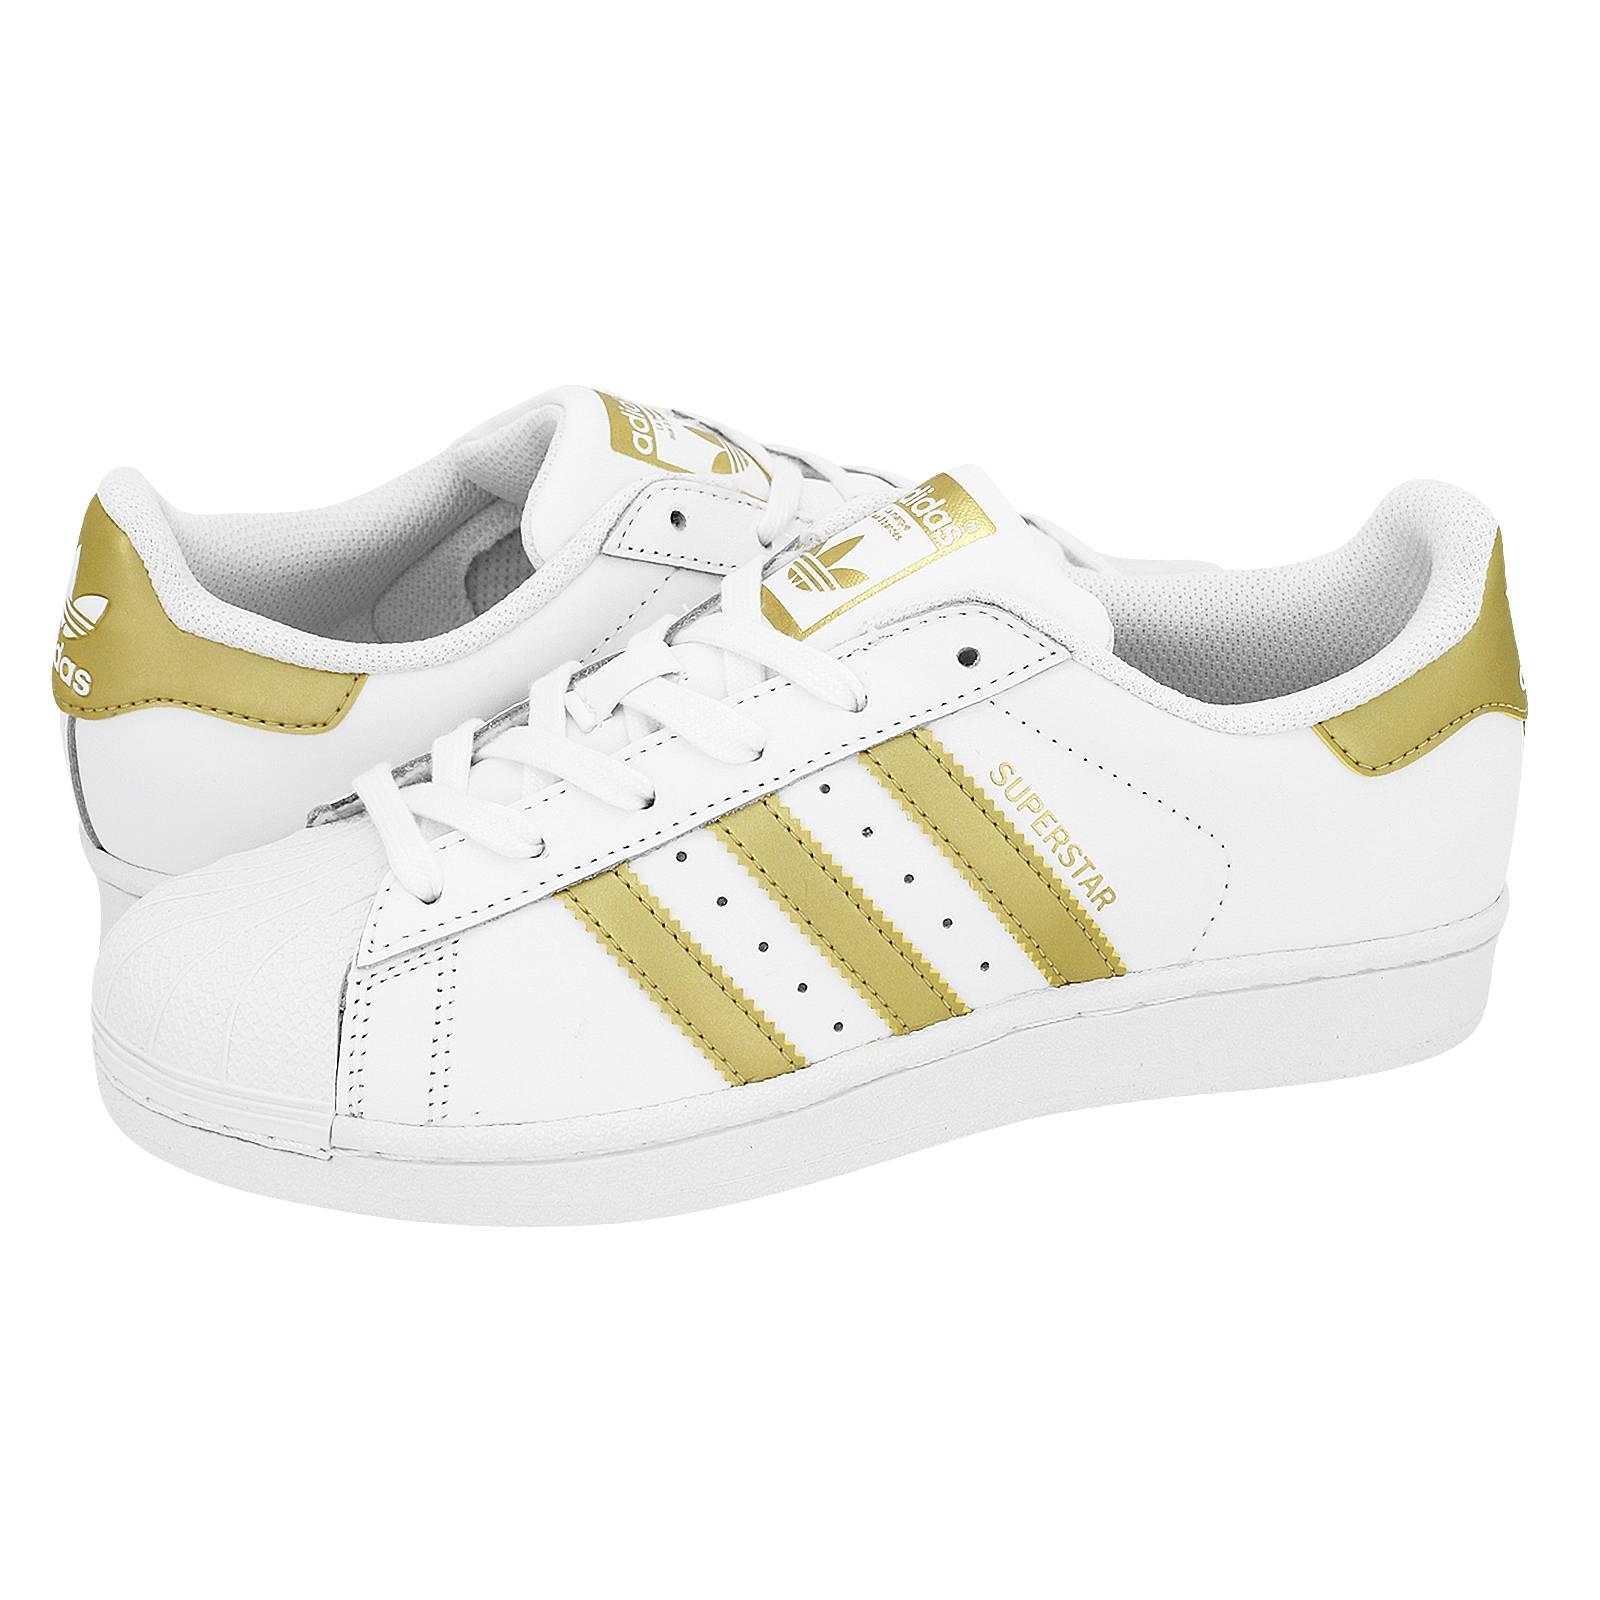 Superstar J - Γυναικεία παπούτσια casual Adidas από δερμα και ... b402dd314e5